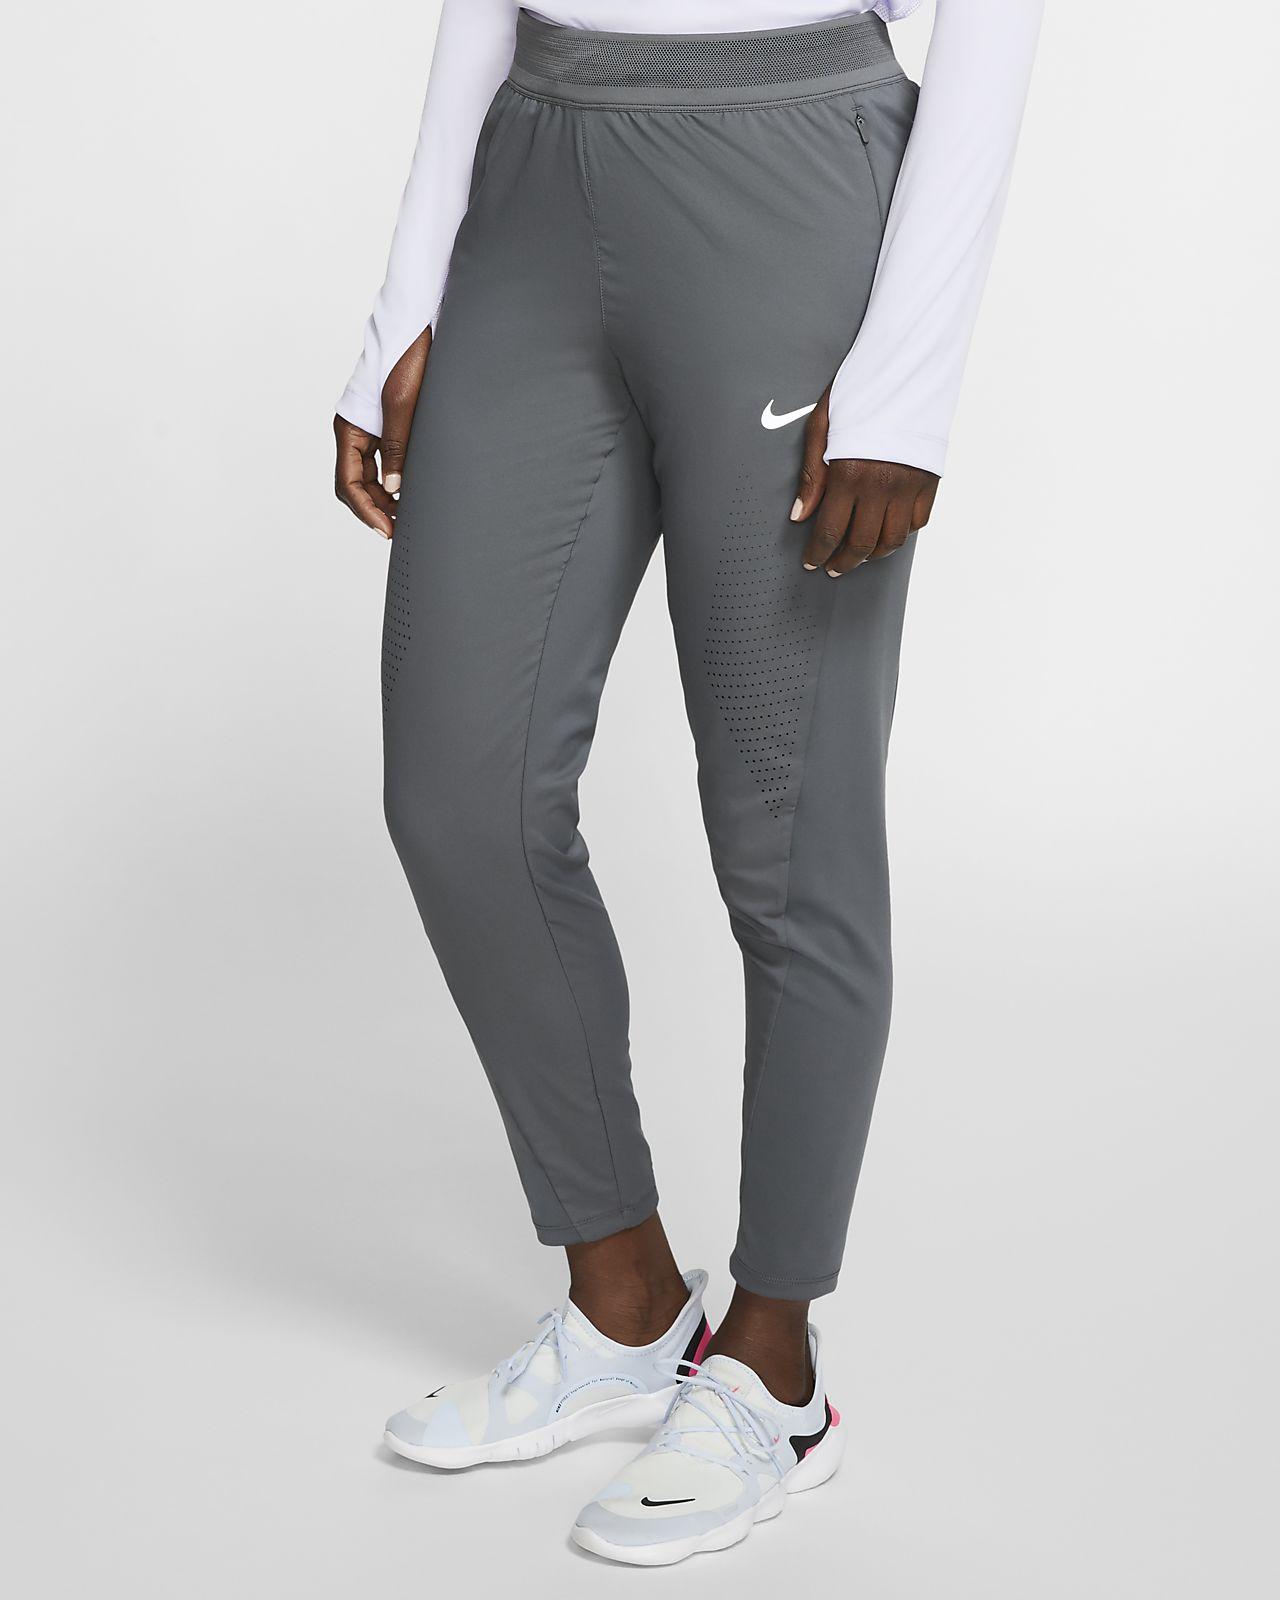 Nike Swift Women's Running Pants